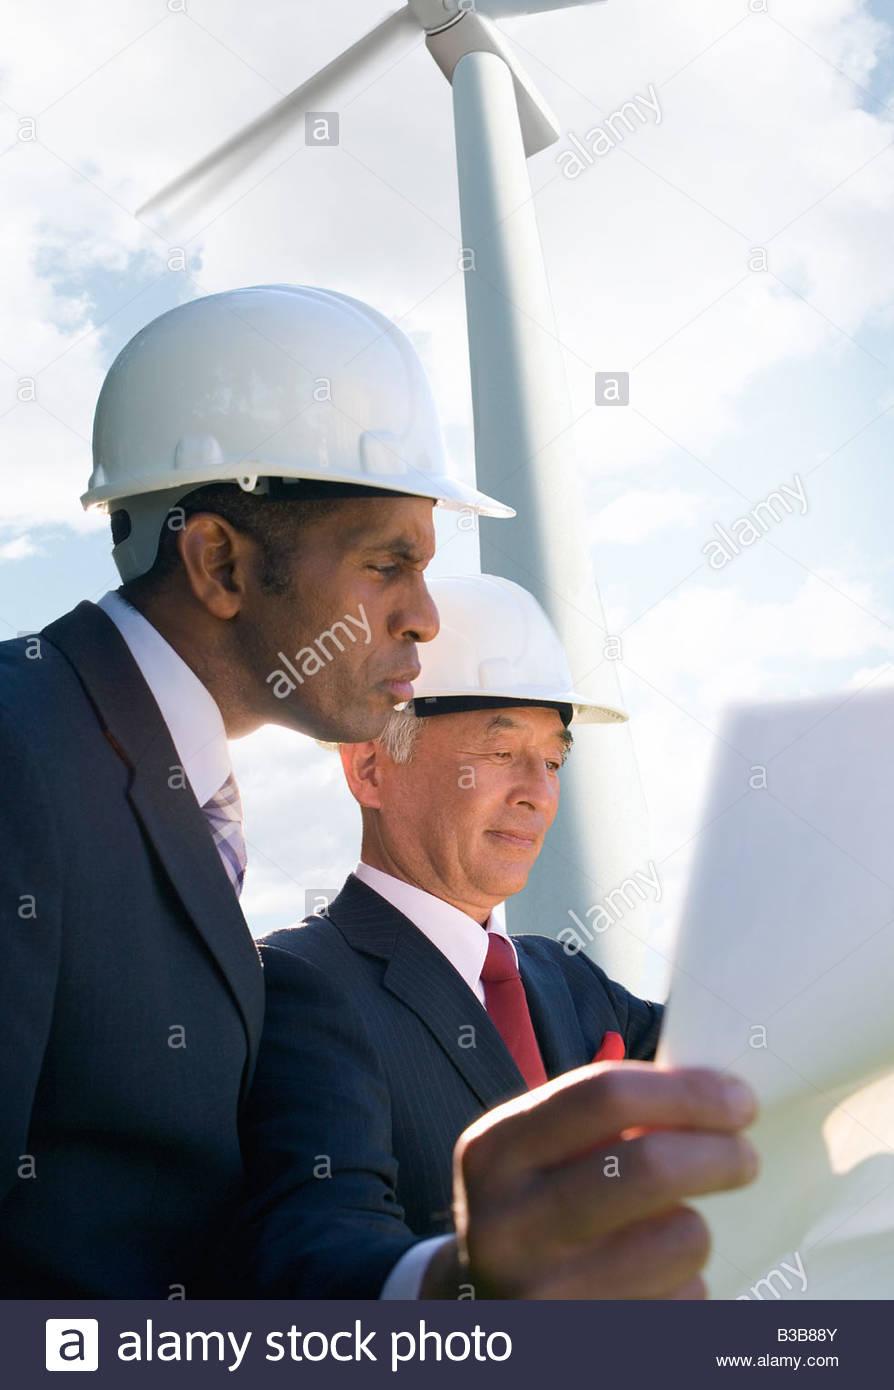 Businessmen inspecting wind power plant - Stock Image